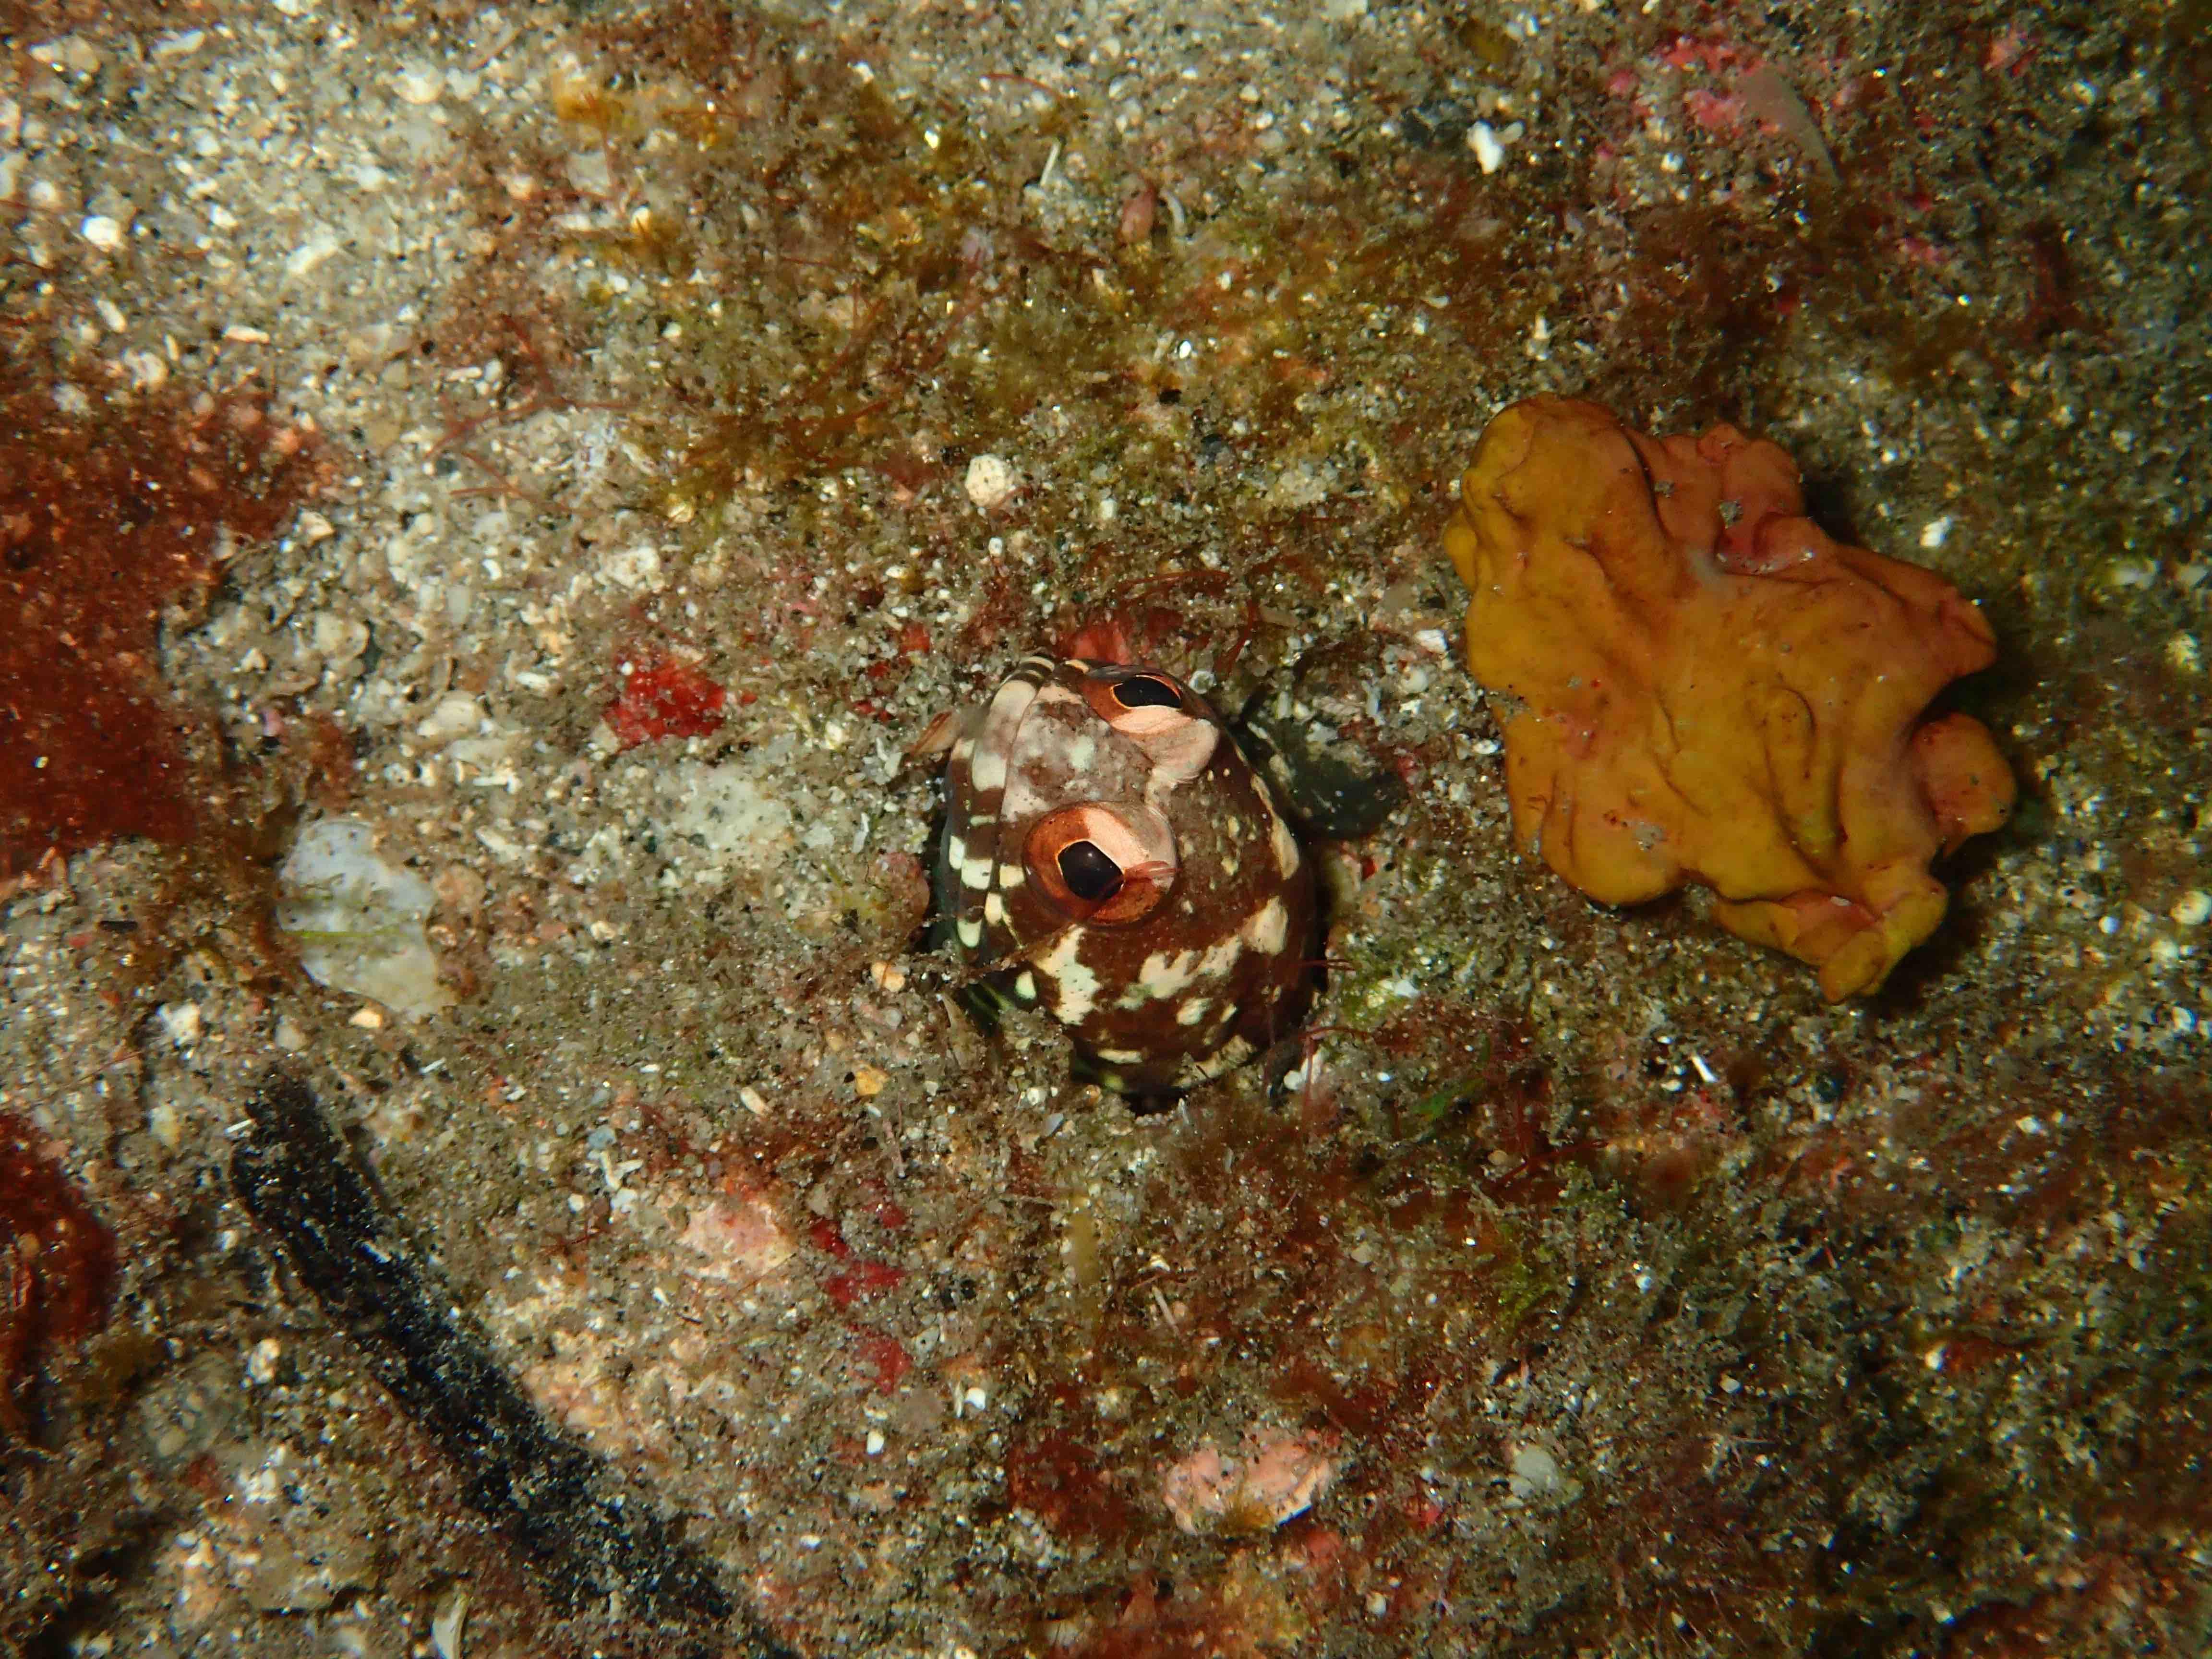 http://www.aquamarine-dive.net/blog/index.html/2015/10/09/0929.jpg